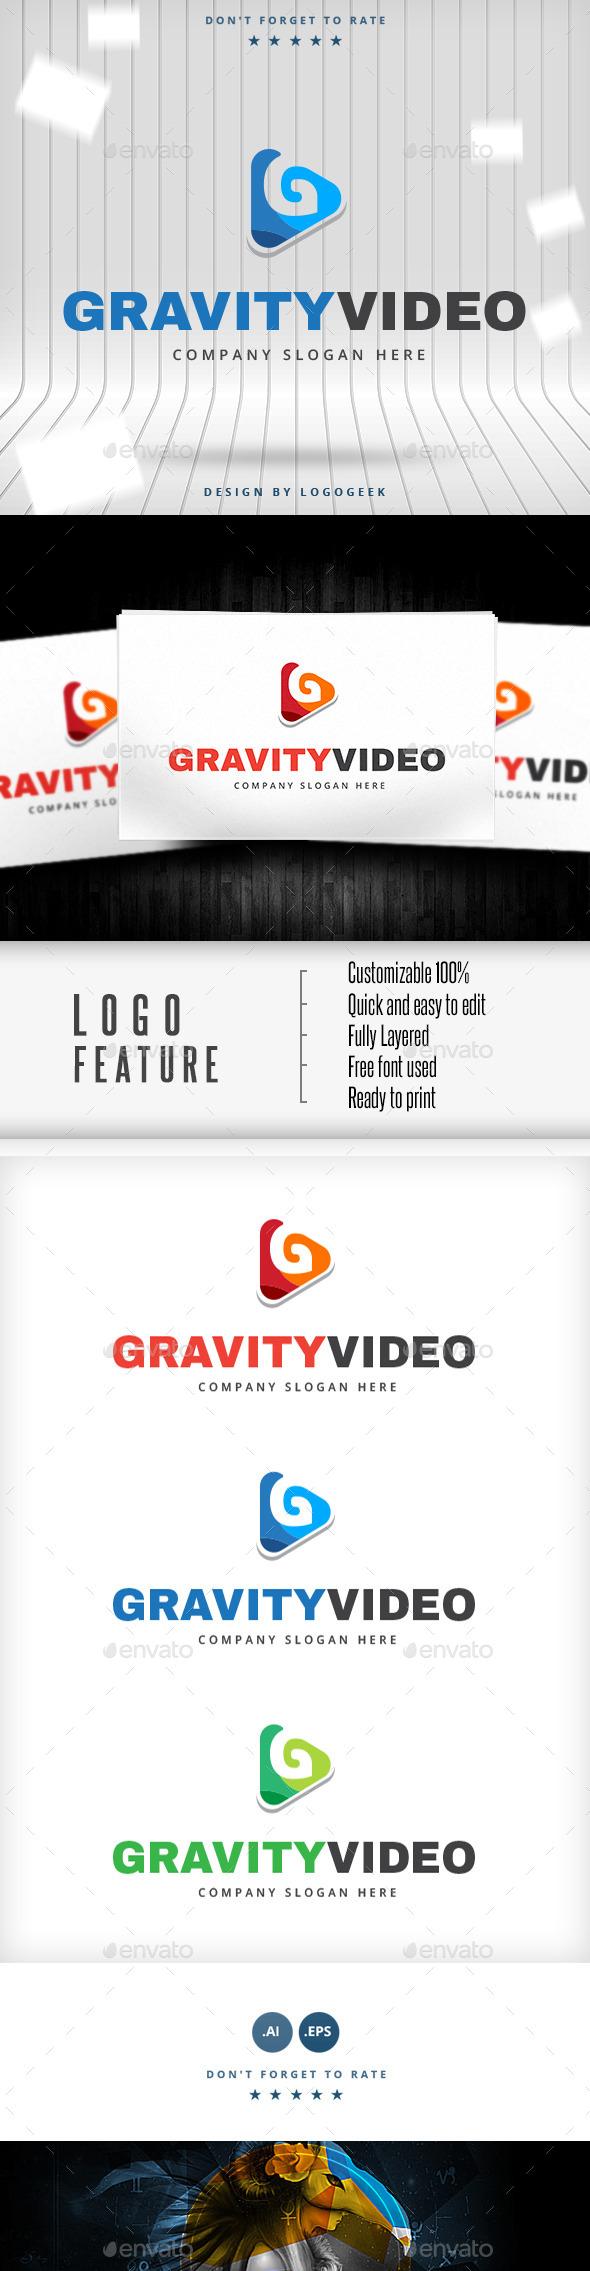 Gravity Video Logo